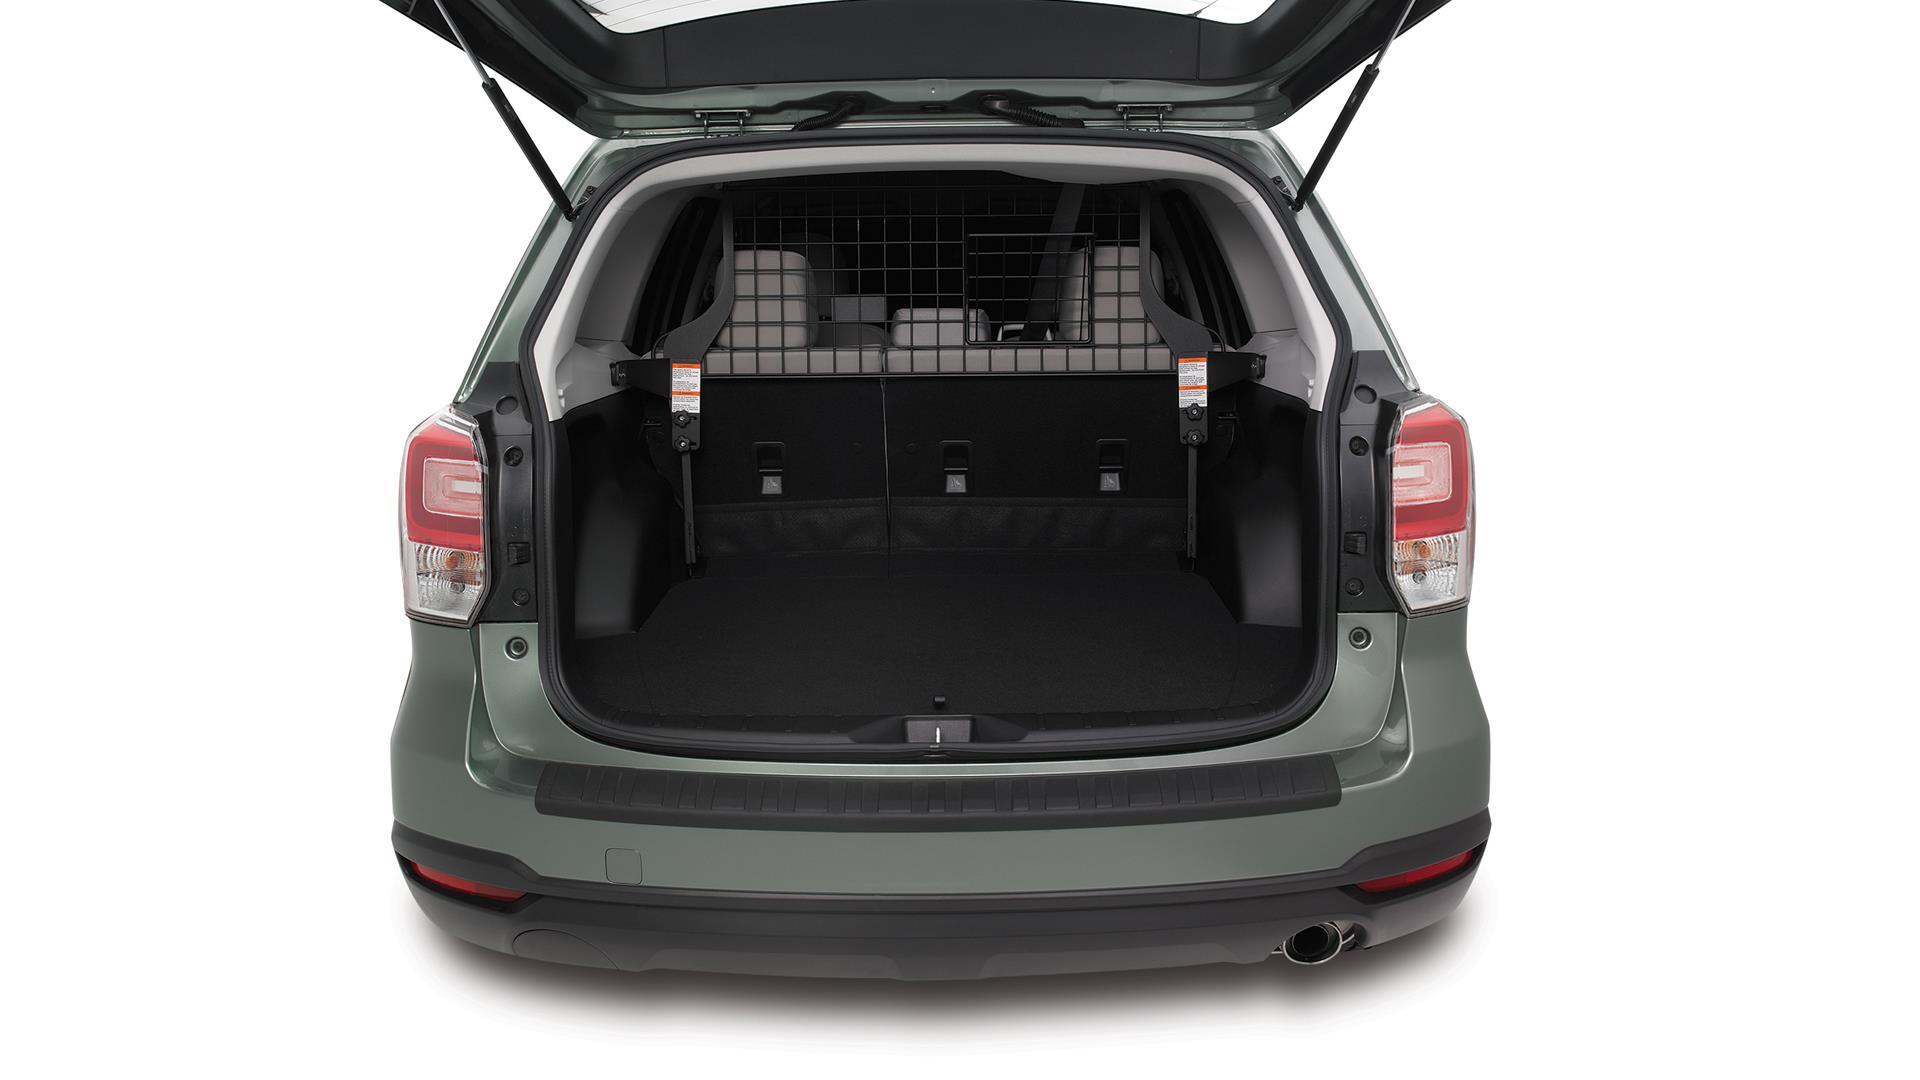 Shop Genuine 2014 Subaru Forester Accessories From Heuberger Subaru